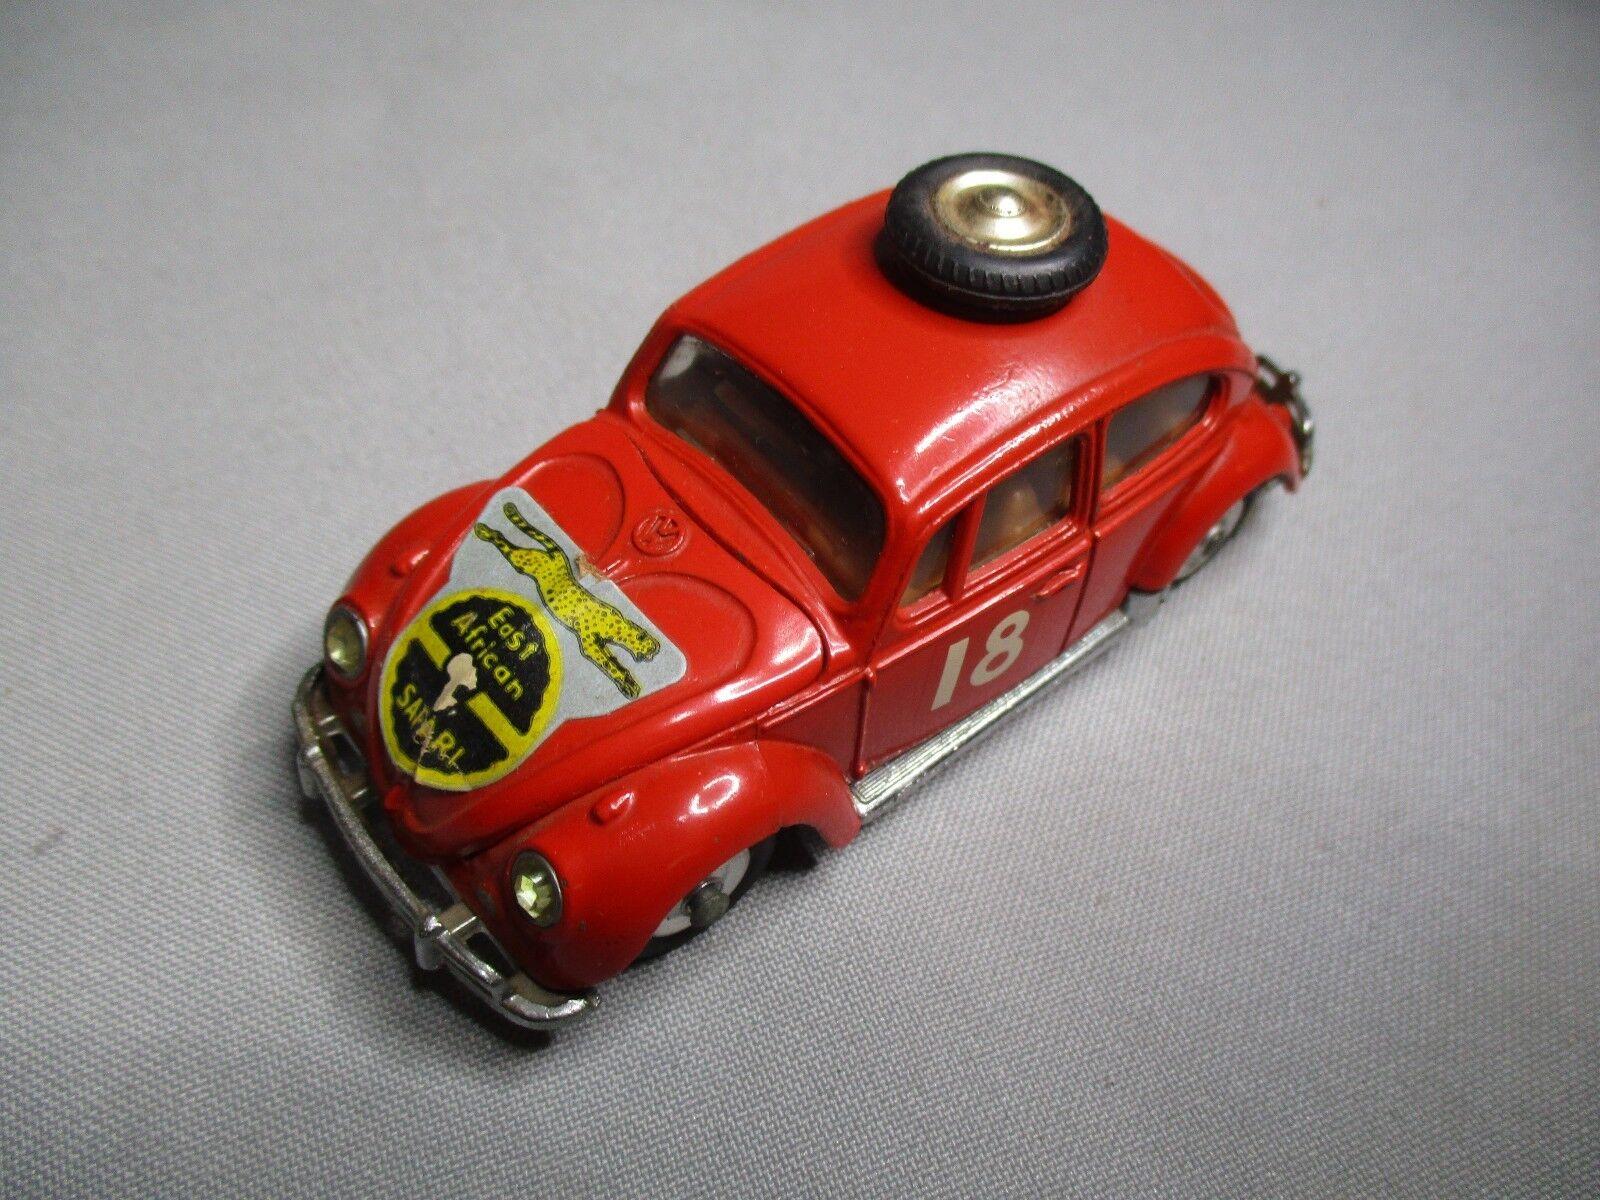 TA461 CORGI TOYS VW VOLKSWAGEN 1200 SALOON EAST SAFARI SAFARI SAFARI Ref 256 1 43 BEL ETAT 4b6e90